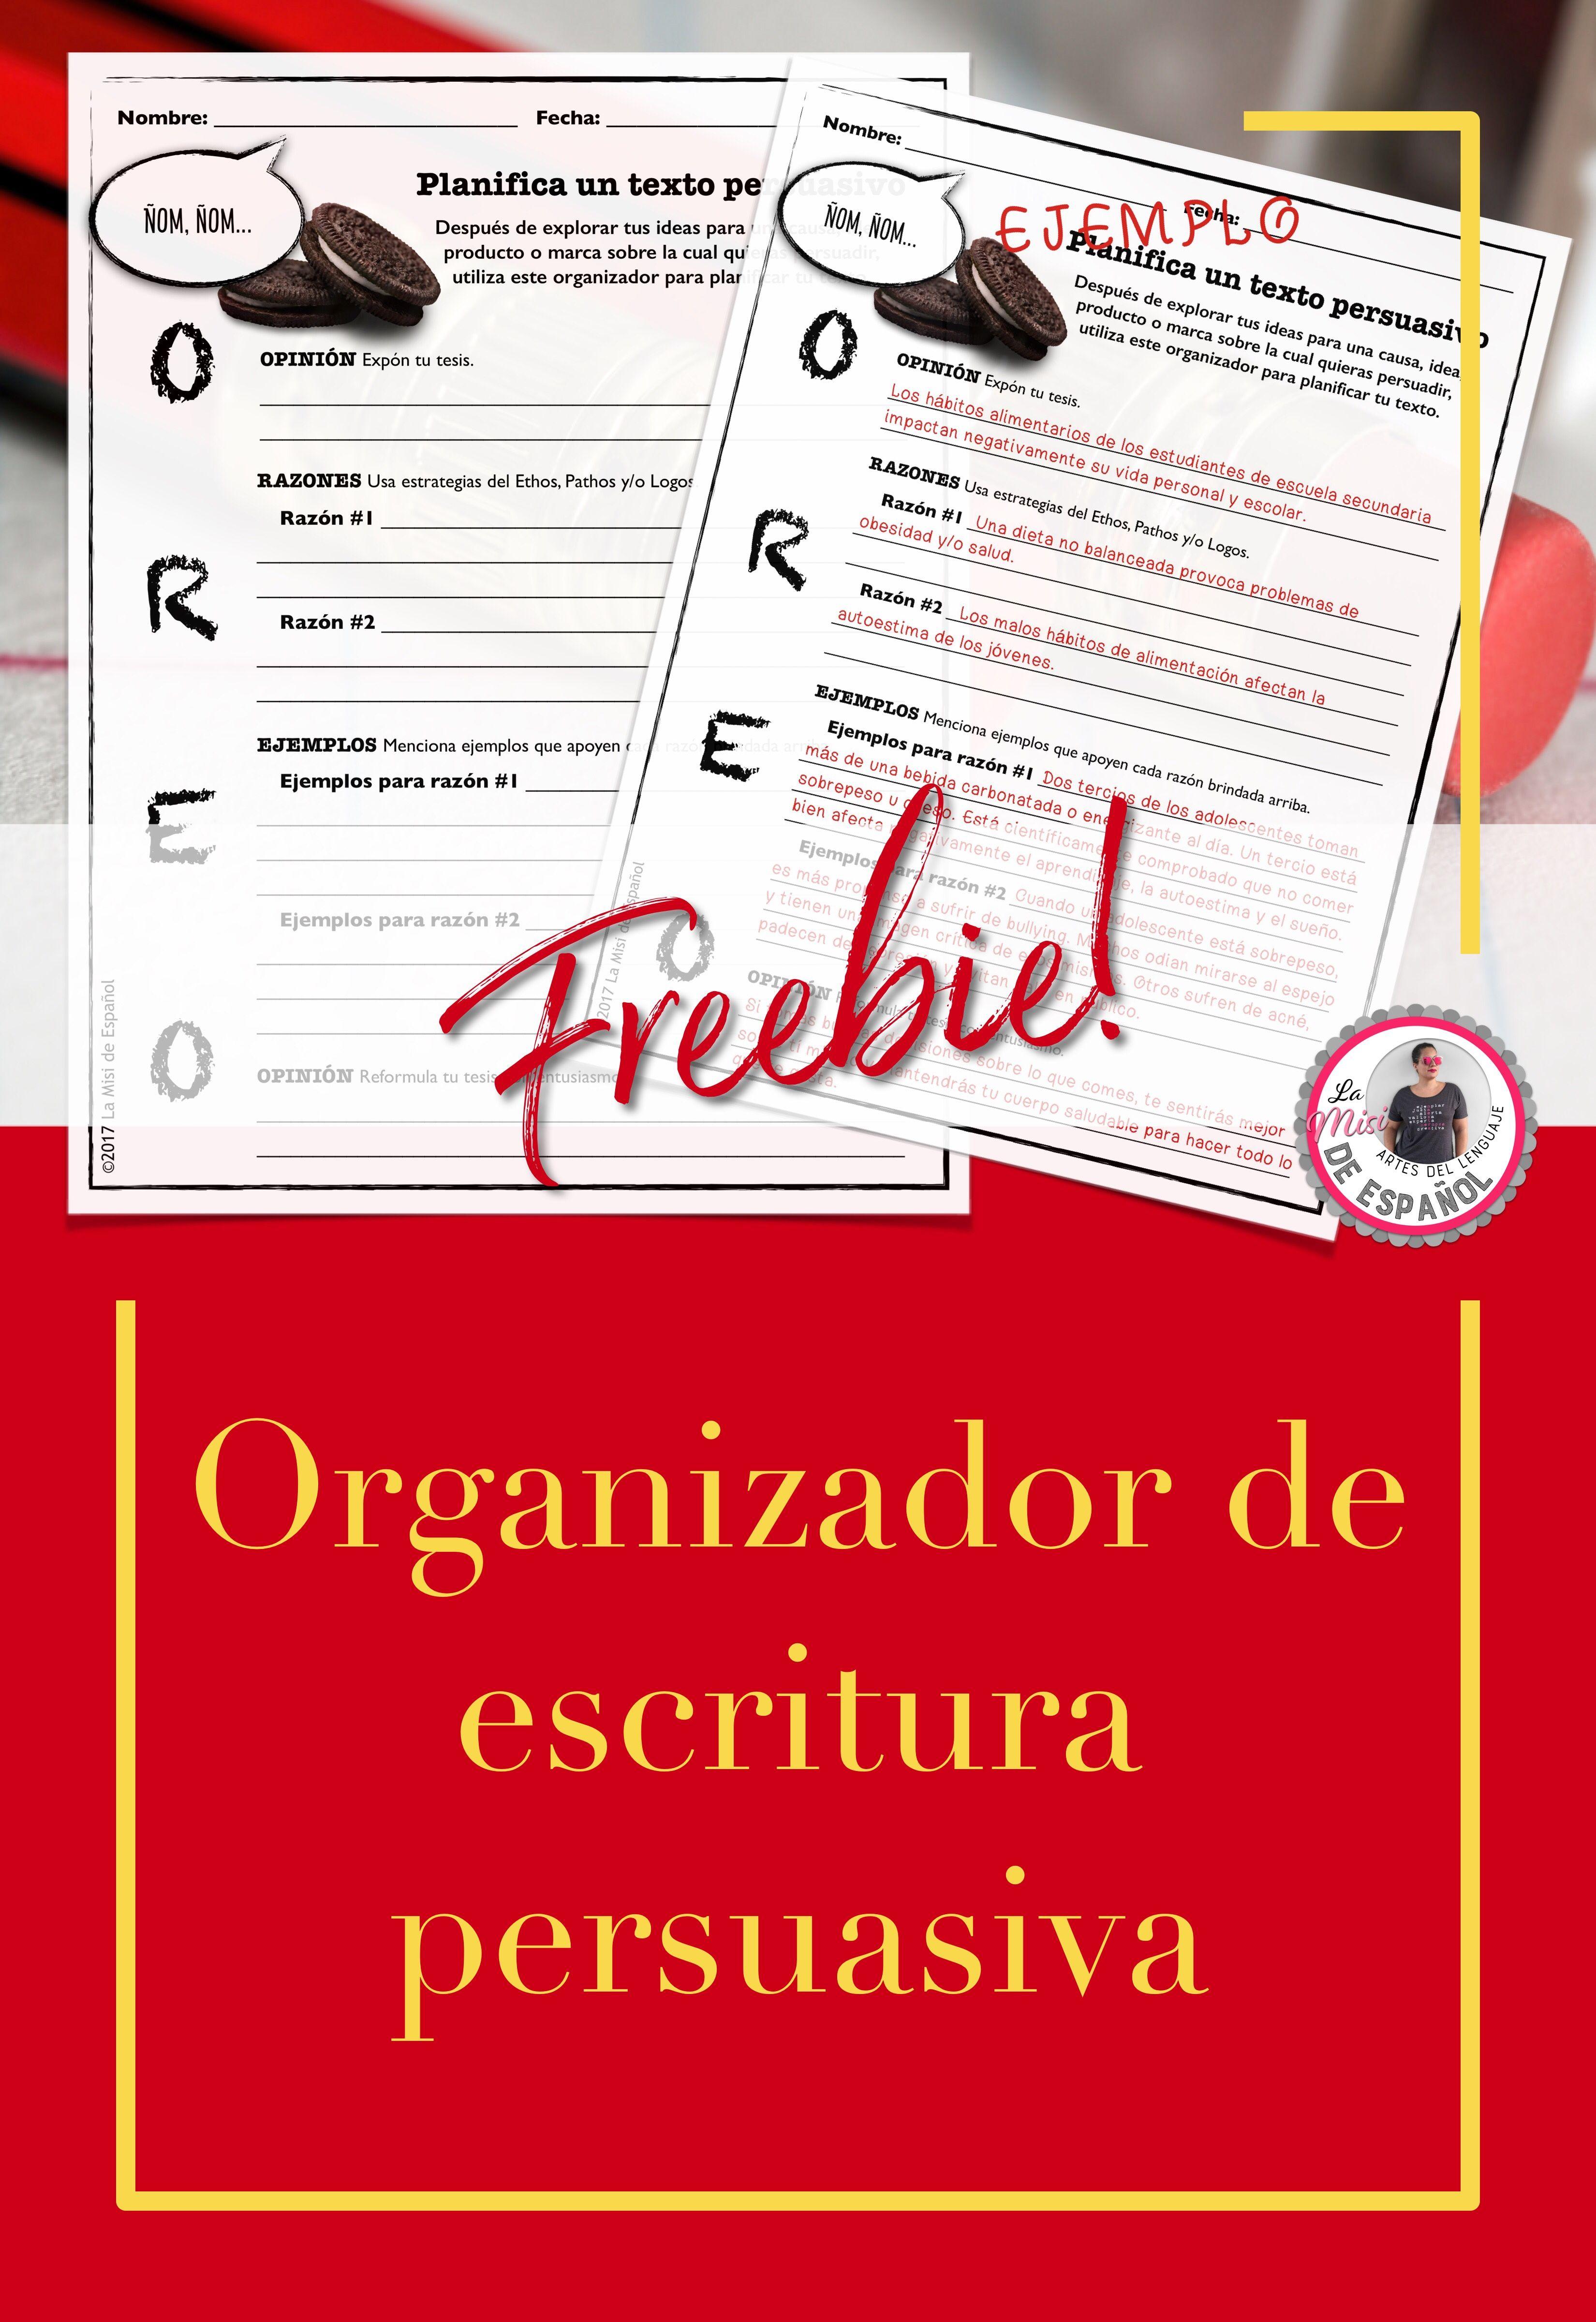 Organizador de escritura persuasiva Oreo gratis en español | Spanish ...